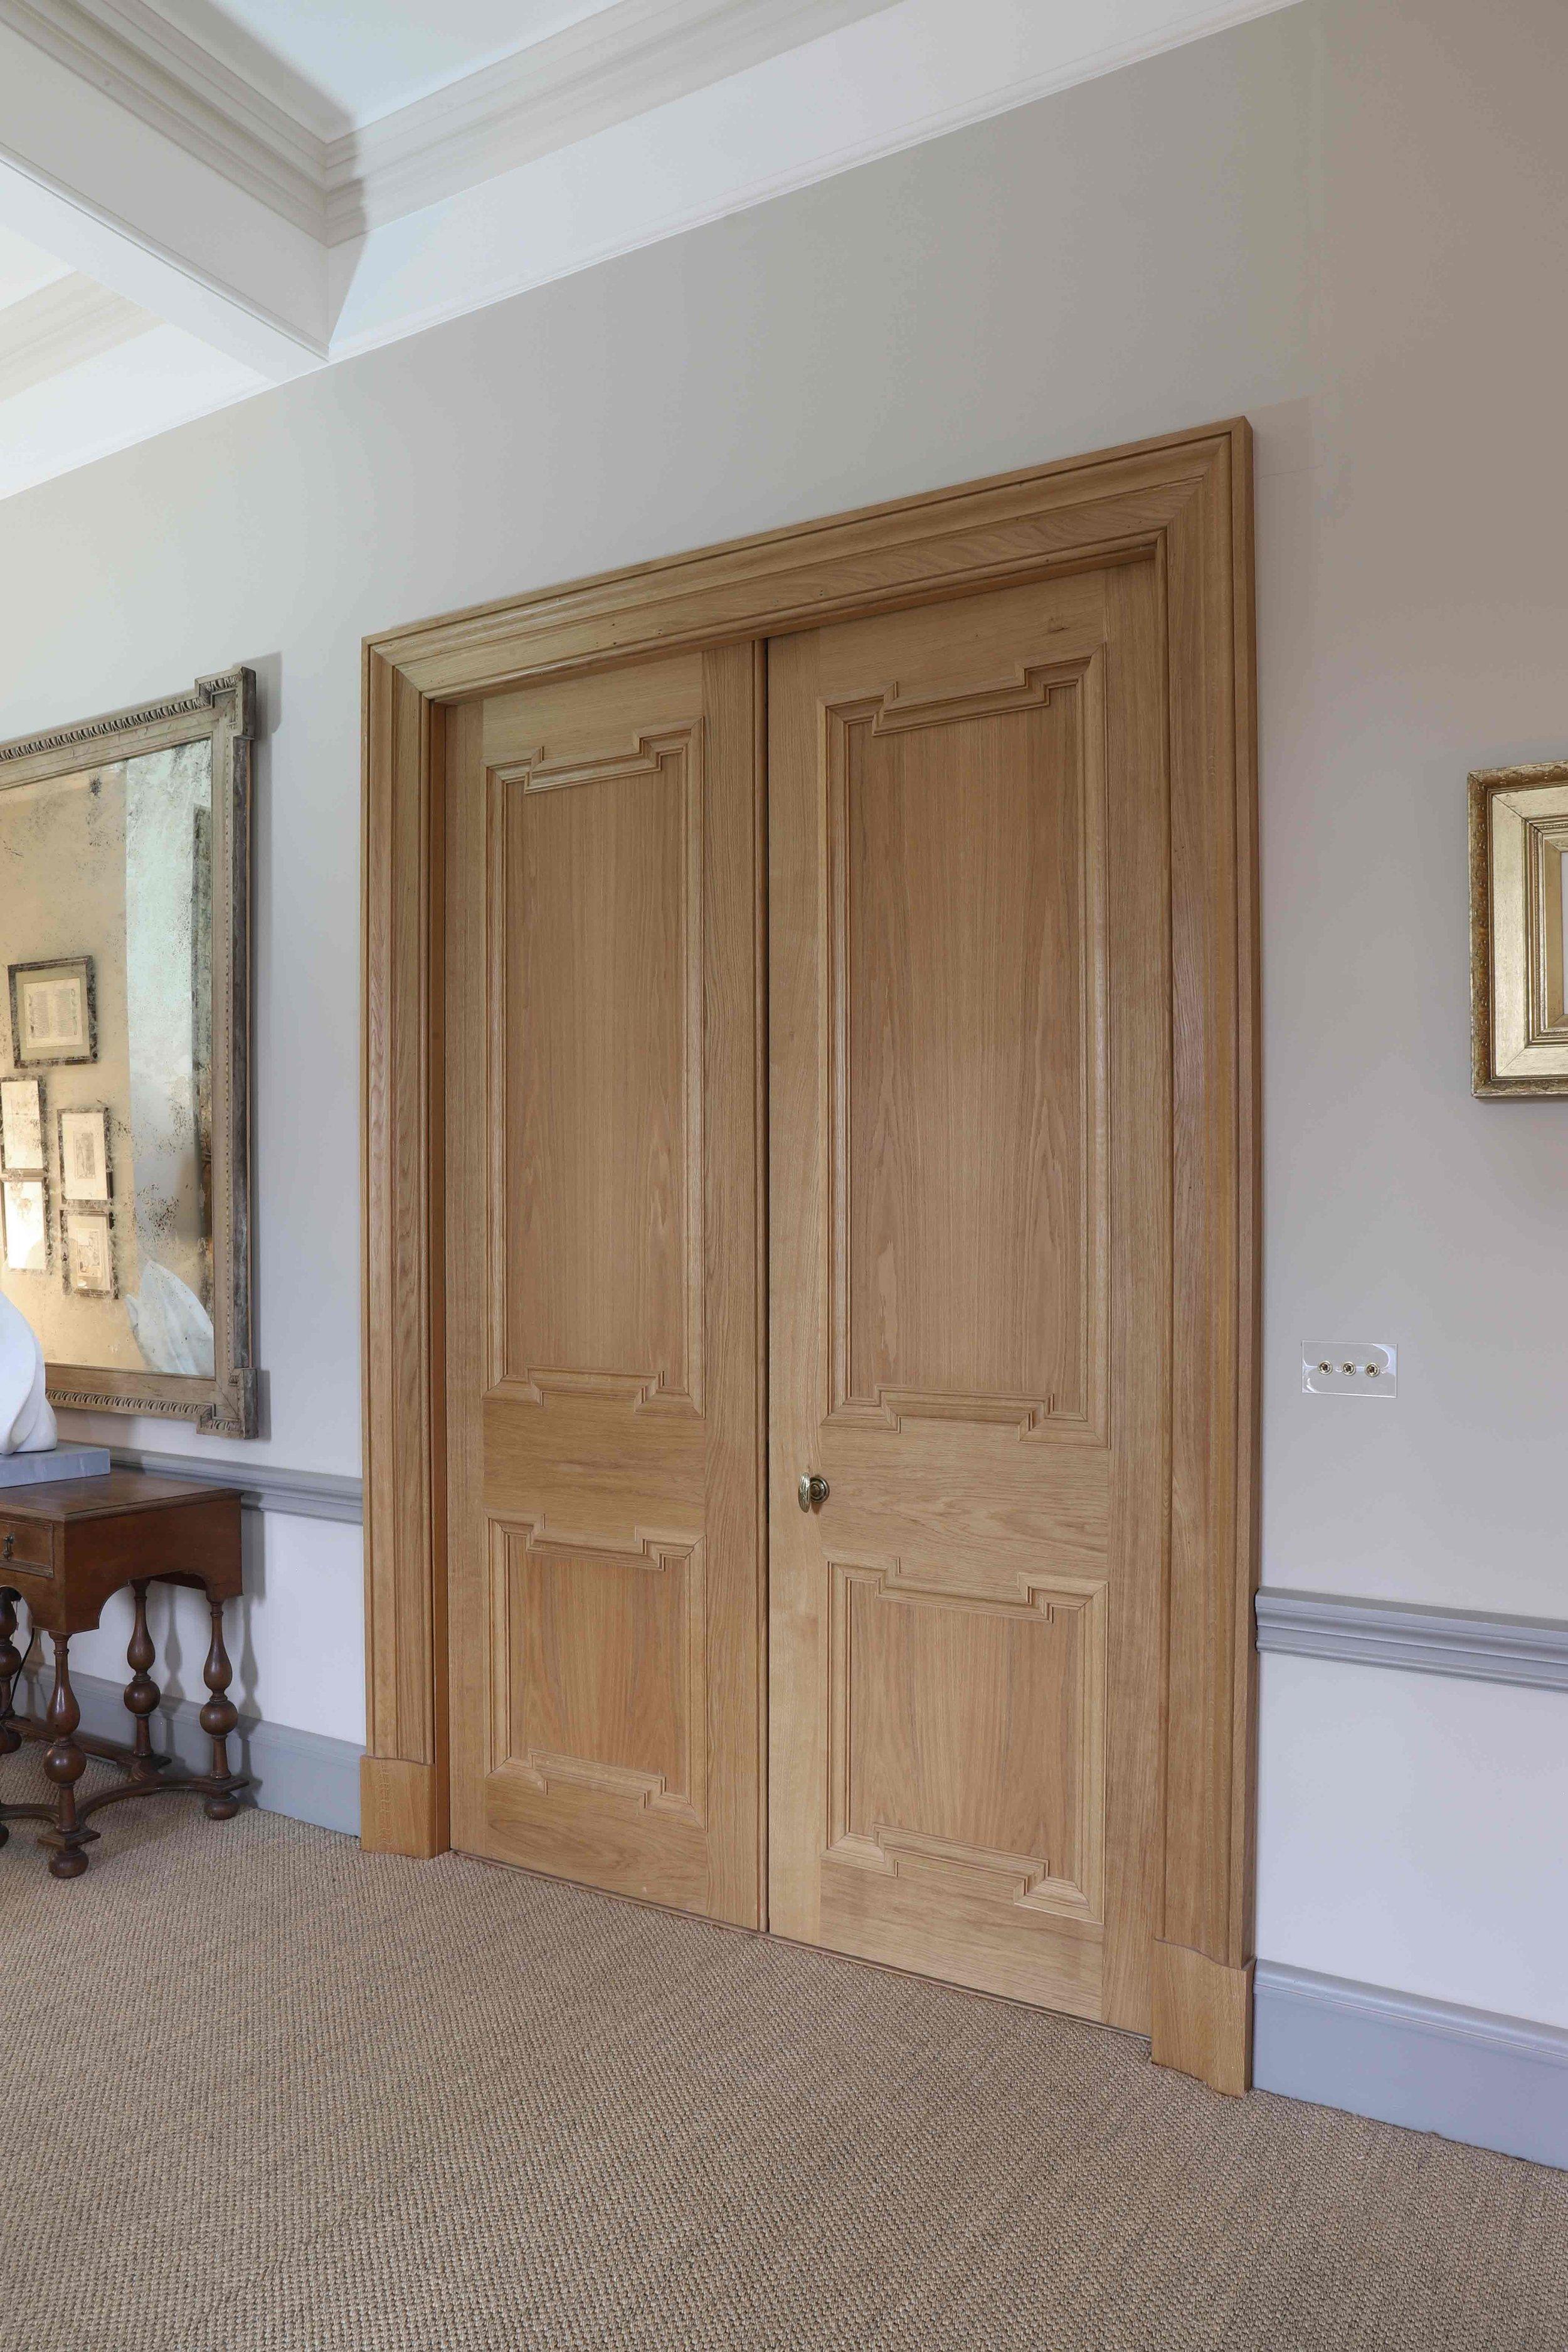 Oiled oak bedroom double doors, Marchmont House, Greenlaw.